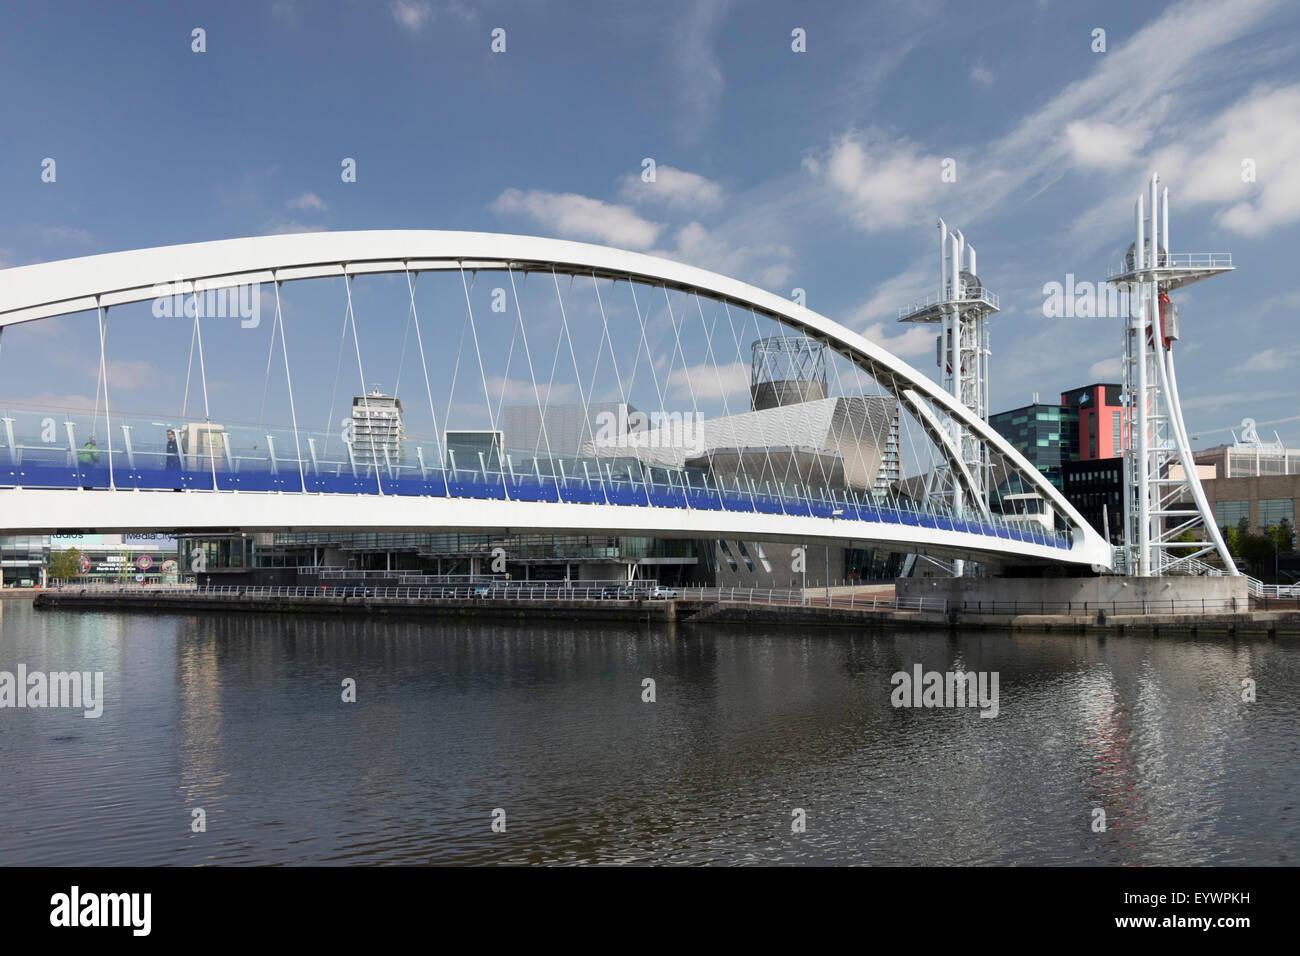 Millennium Lift Bridge, Salford Quays, Manchester, England, United Kingdom, Europe - Stock Image